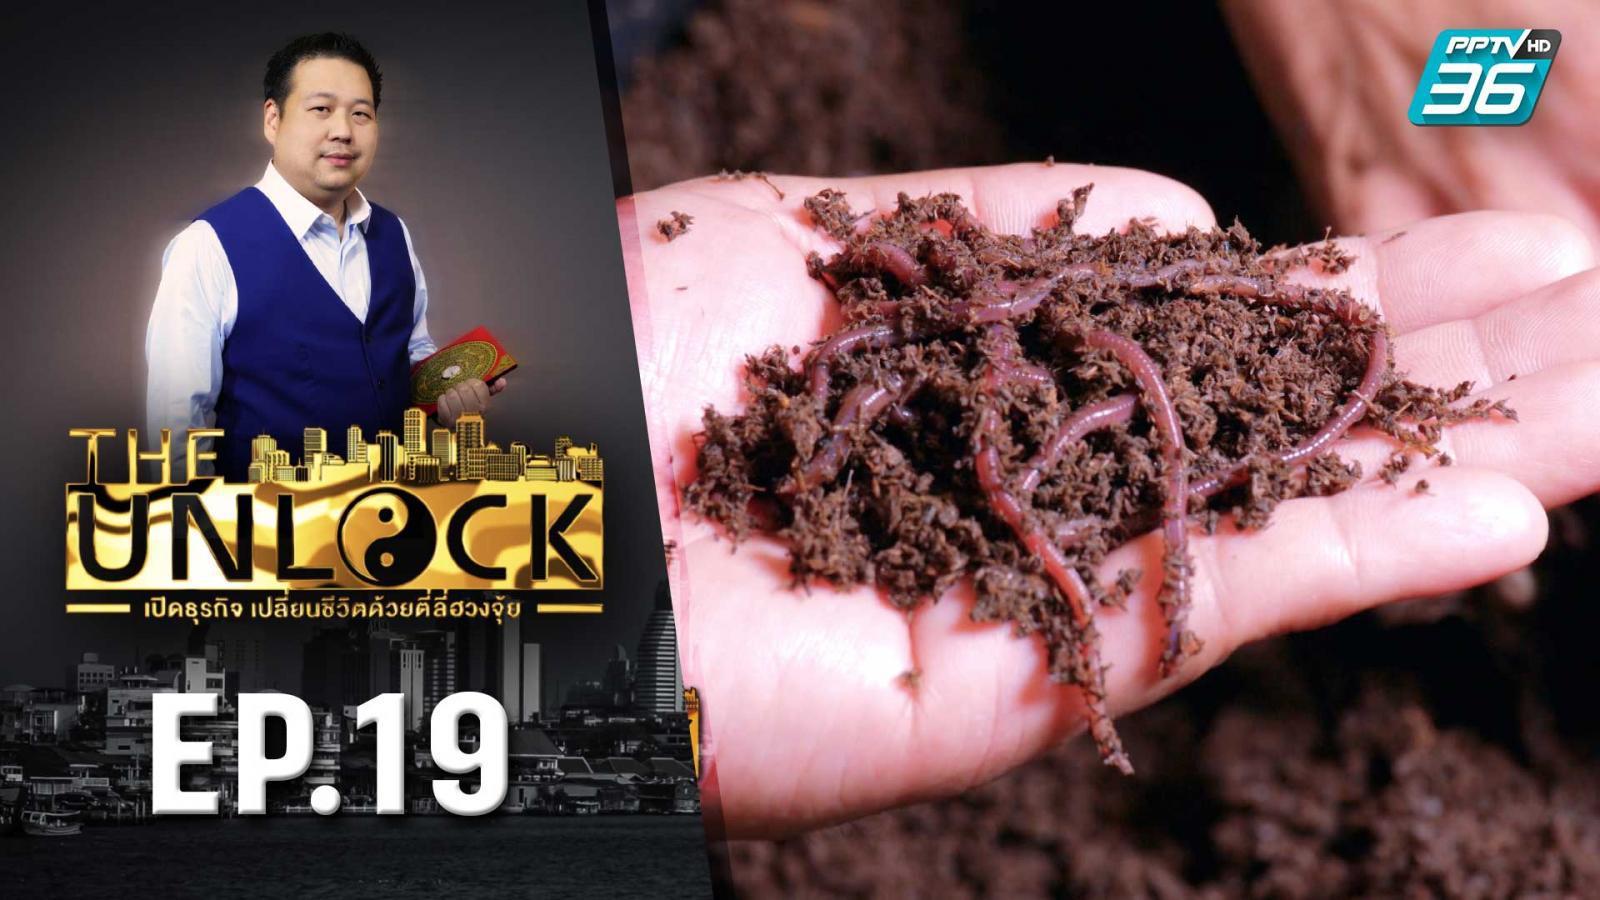 The Unlock เปิดธุรกิจ เปลี่ยนชีวิตด้วยตี่ลี่ฮวงจุ้ย | ฟาร์มไส้เดือน EP.19 | PPTVHD 36